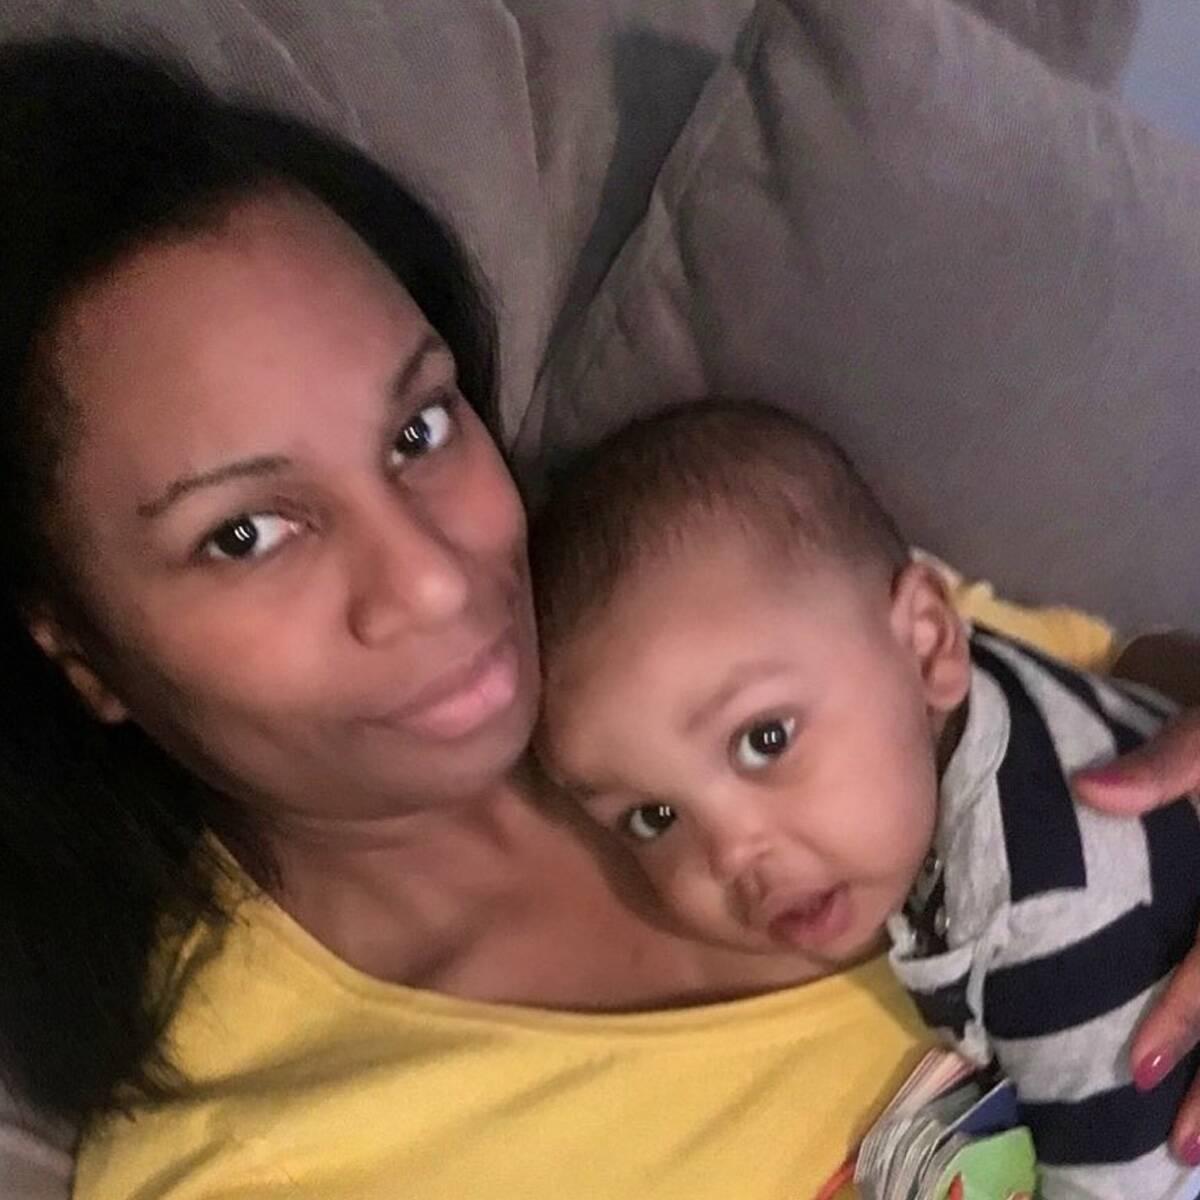 CNN's Rene Marsh Announces Death of 2-Year-Old Son Blake